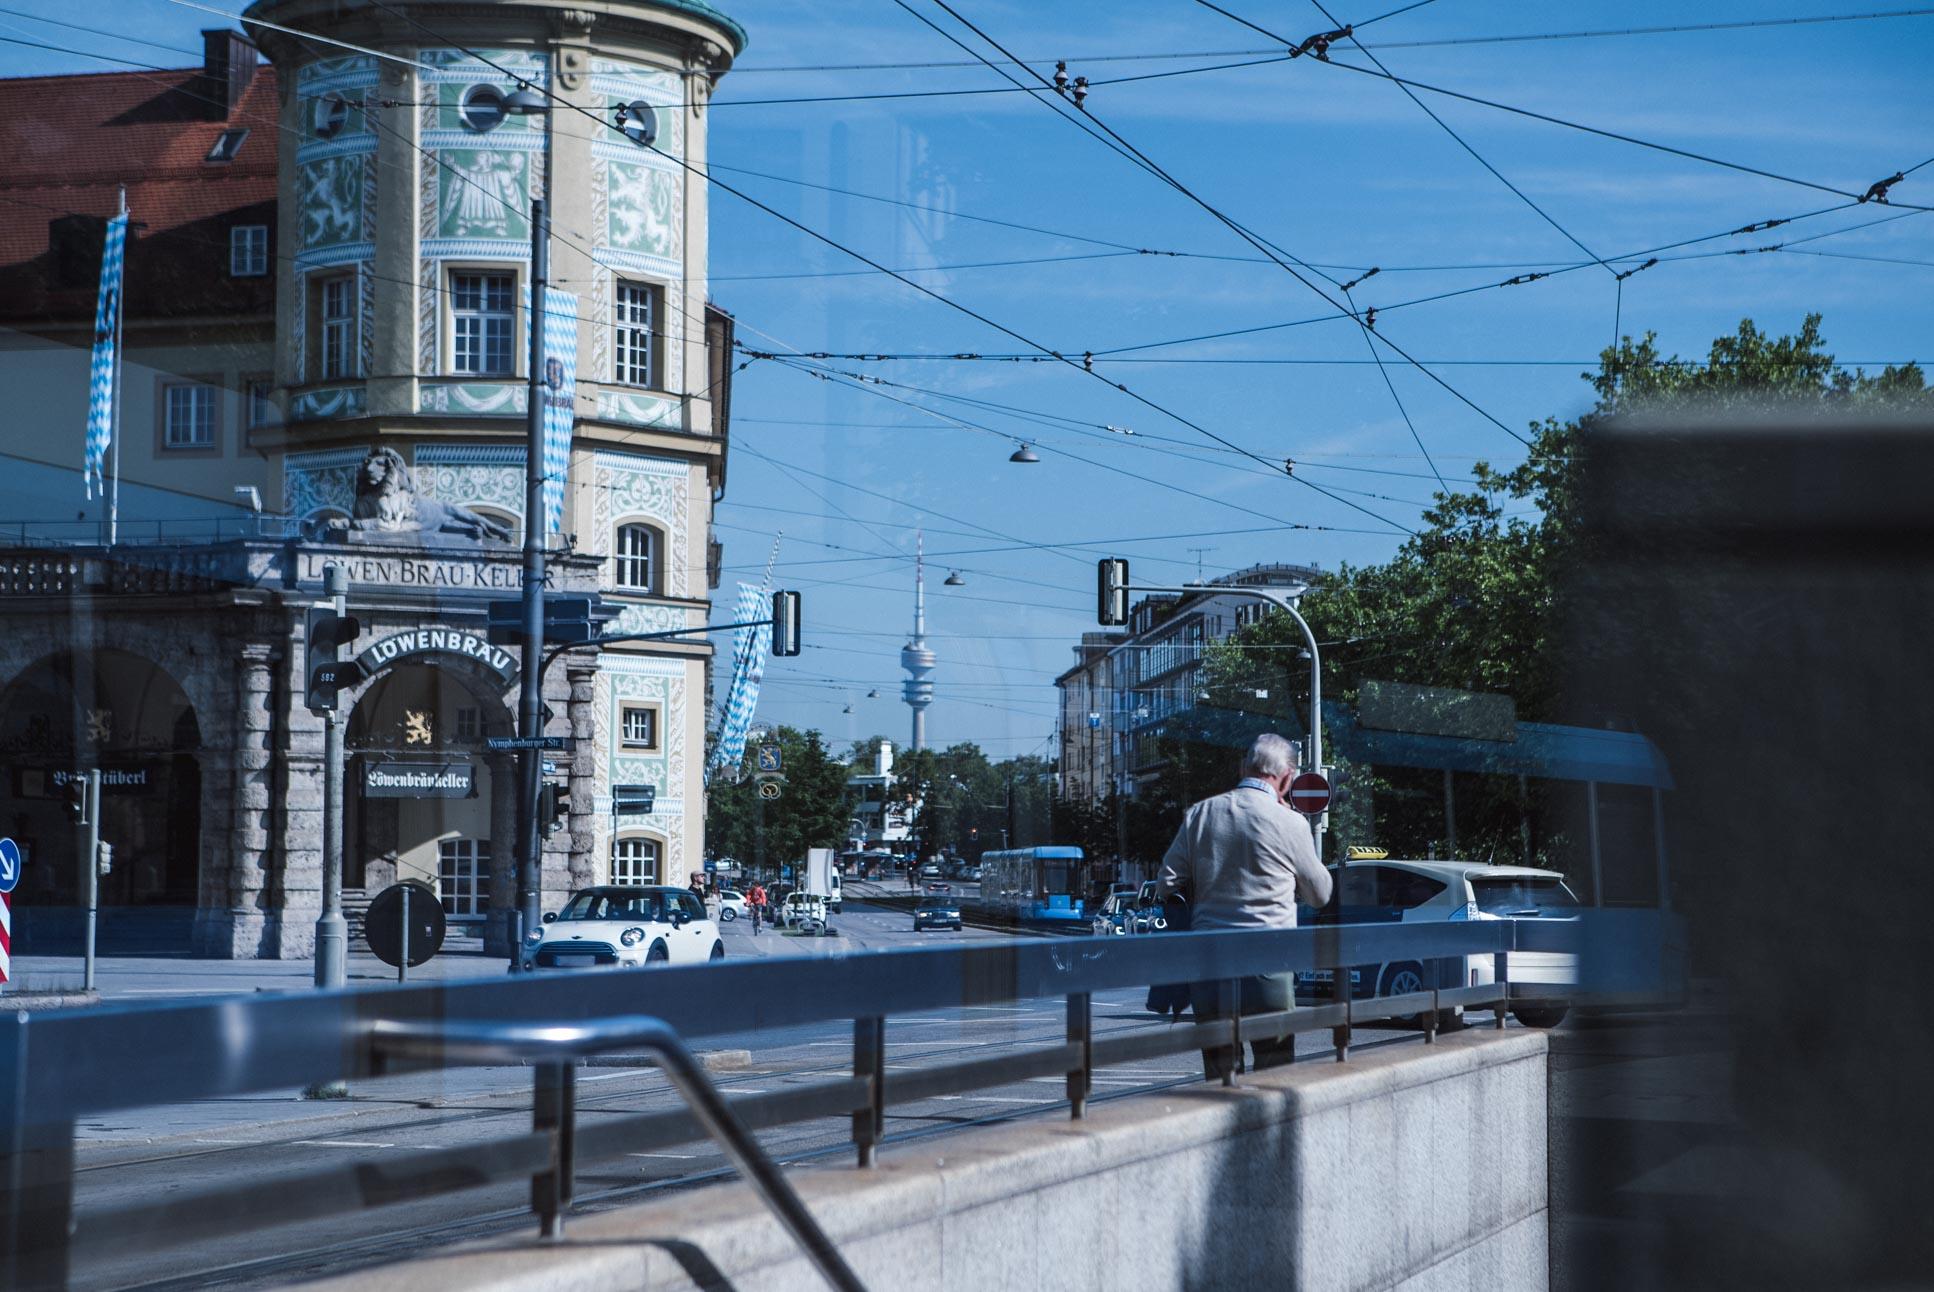 Photo by Pascal Sommer - Stiglmaierplatz tram stop